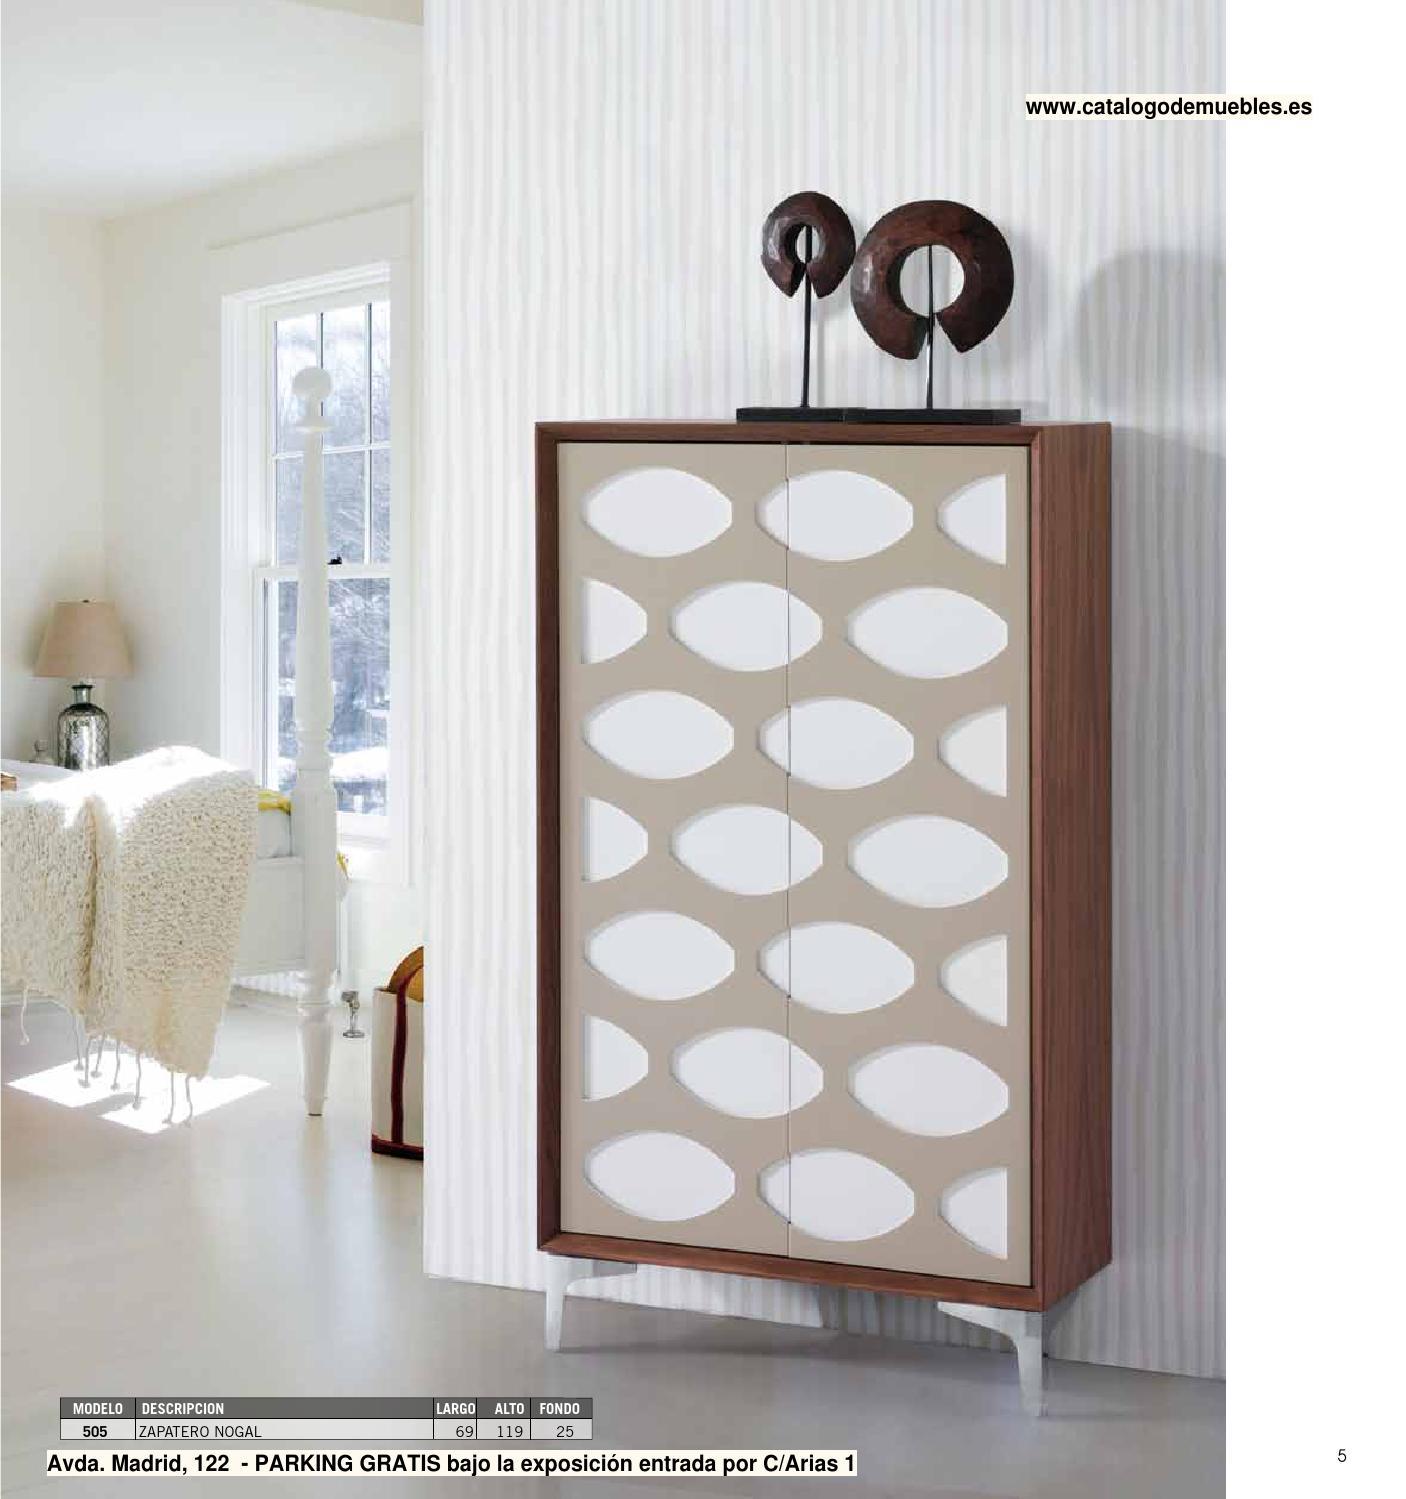 Catálogo De Mueble Auxiliar HOME DECOR By Catálogo De